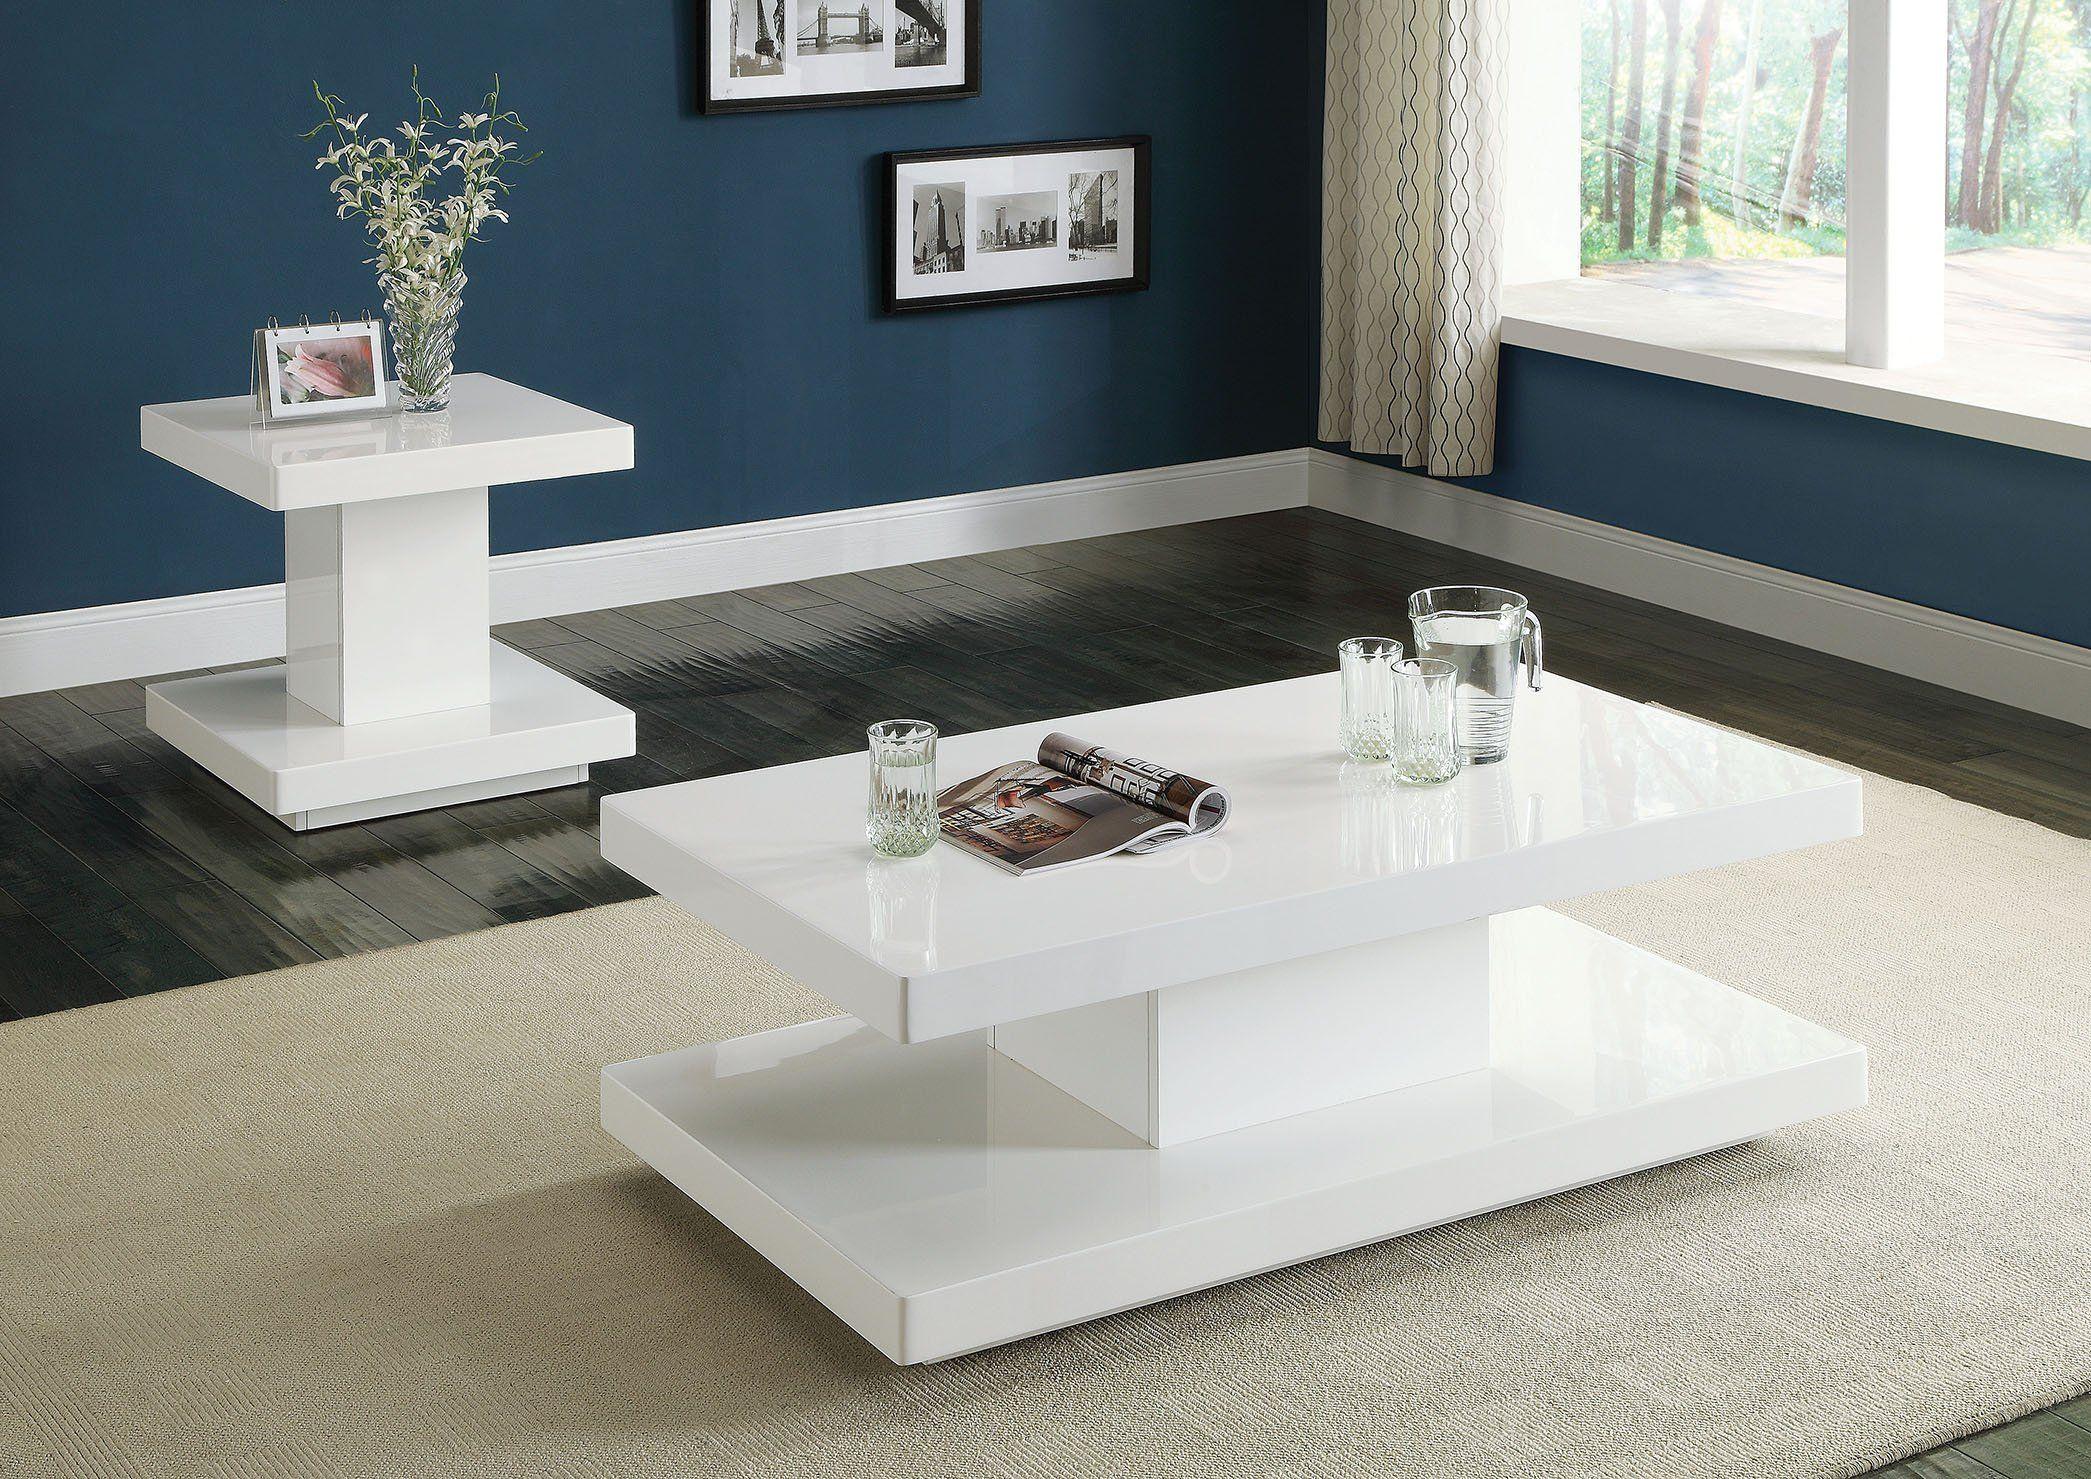 Acme Imena Modern White Coffee Table Set Coffee Table Coffee Table White Coffee Table Rectangle [ 1479 x 2091 Pixel ]